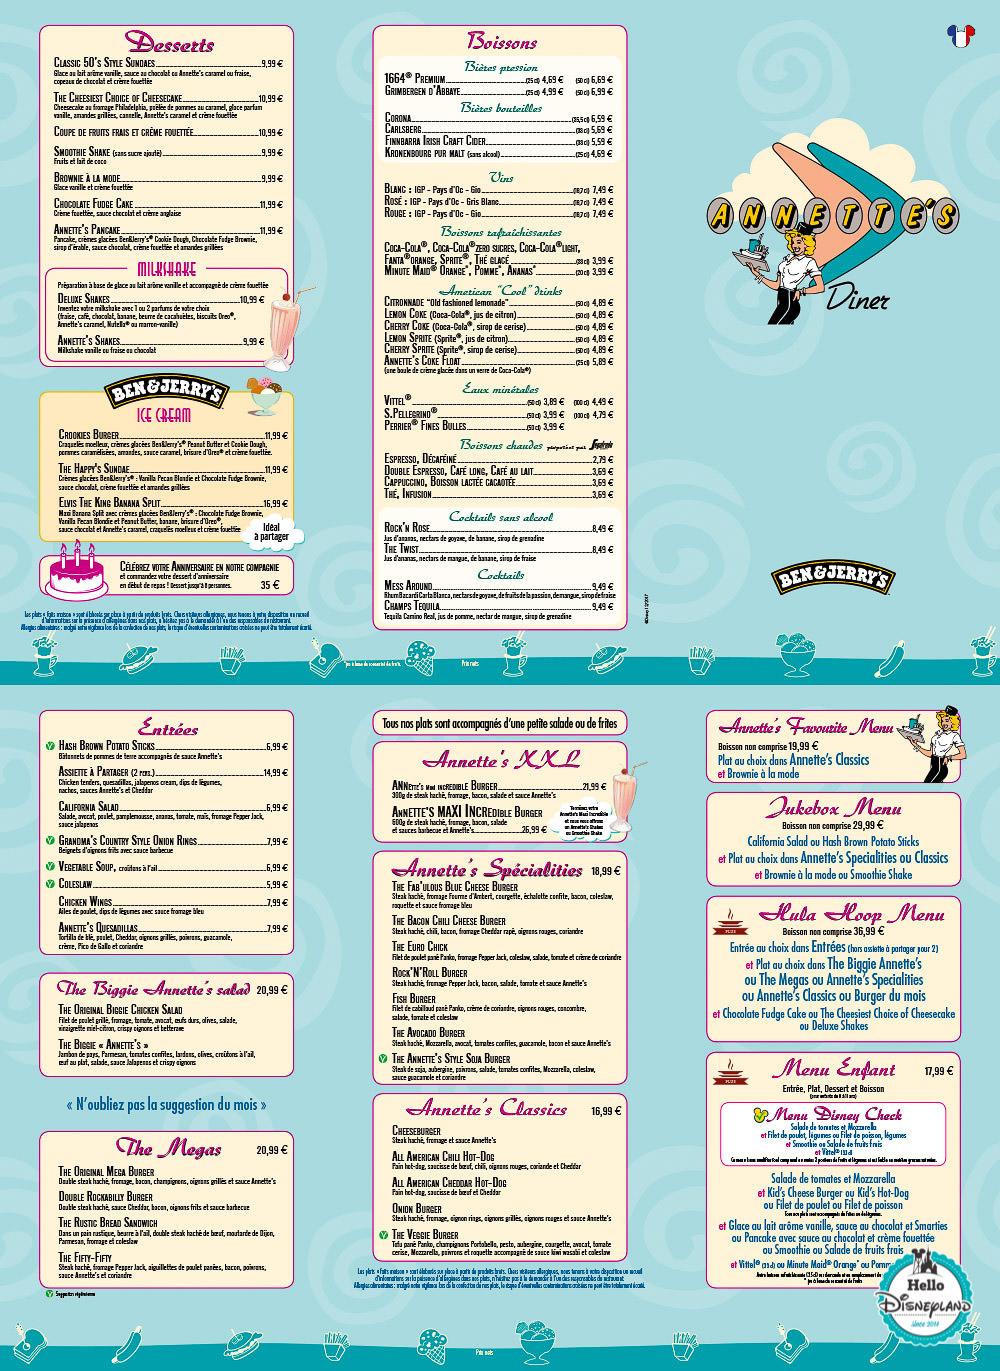 Menus Annette's Diner Disneyland Paris